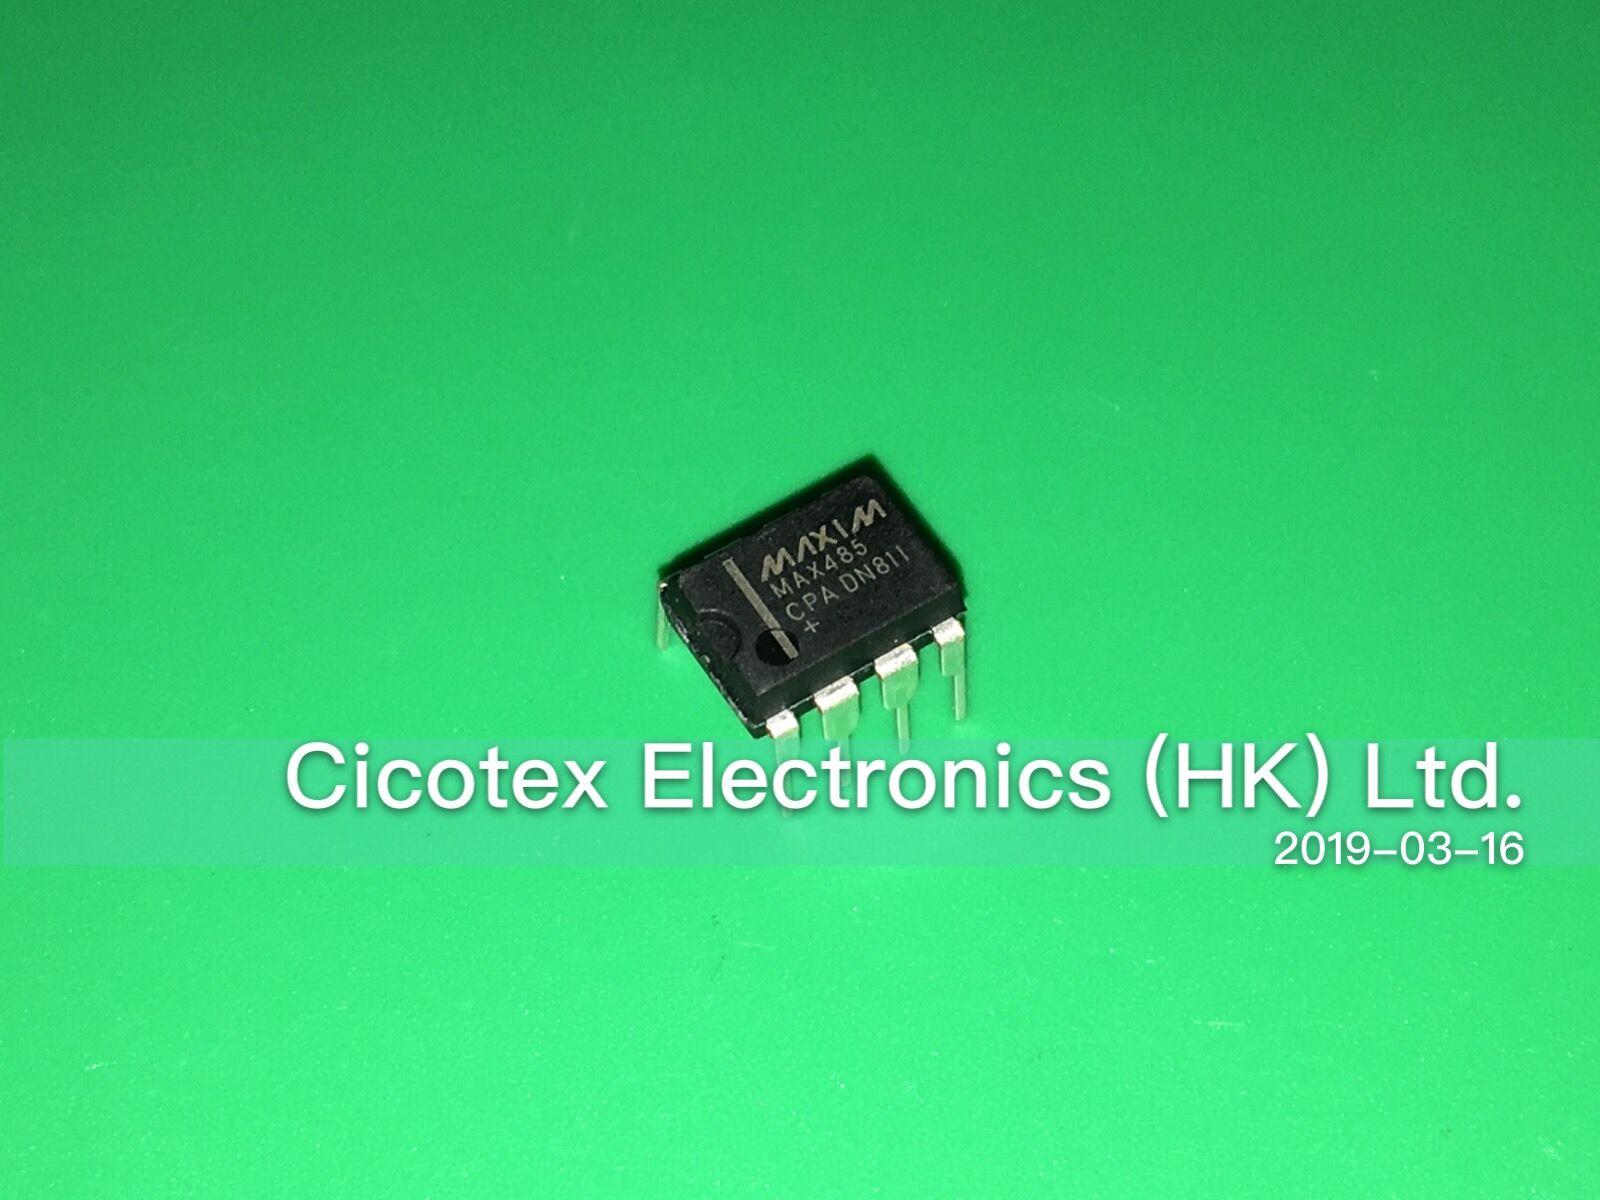 10pcs/lot MAX485CPA+ DIP8 IC TXRX RS485/RS422 LOWPWR 8-DIP MAX485 CPA MAX 485CPA